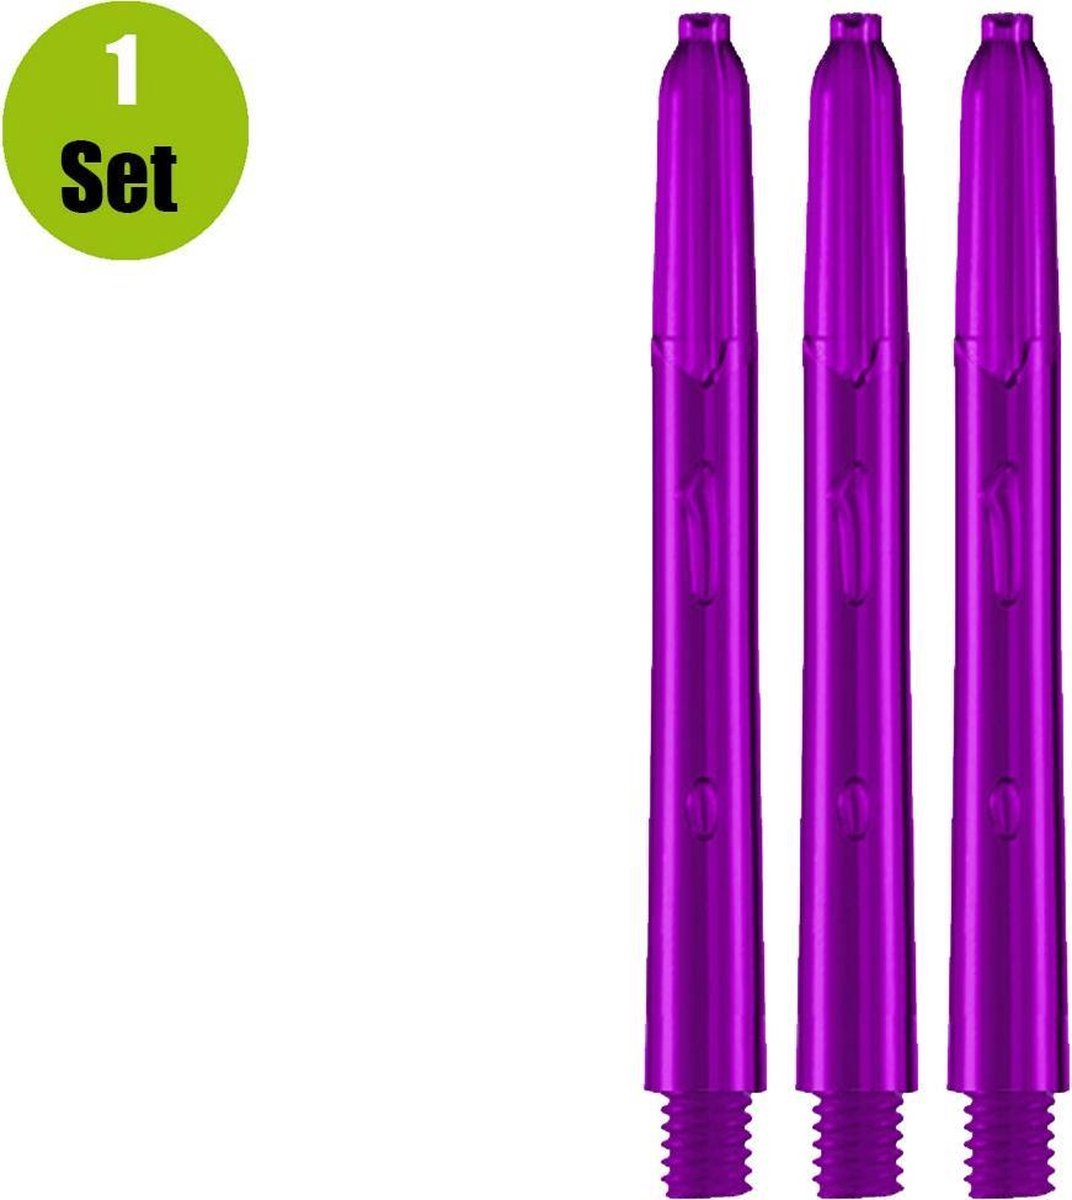 Glow Dart Shafts - Paars - Medium - (1 Set)